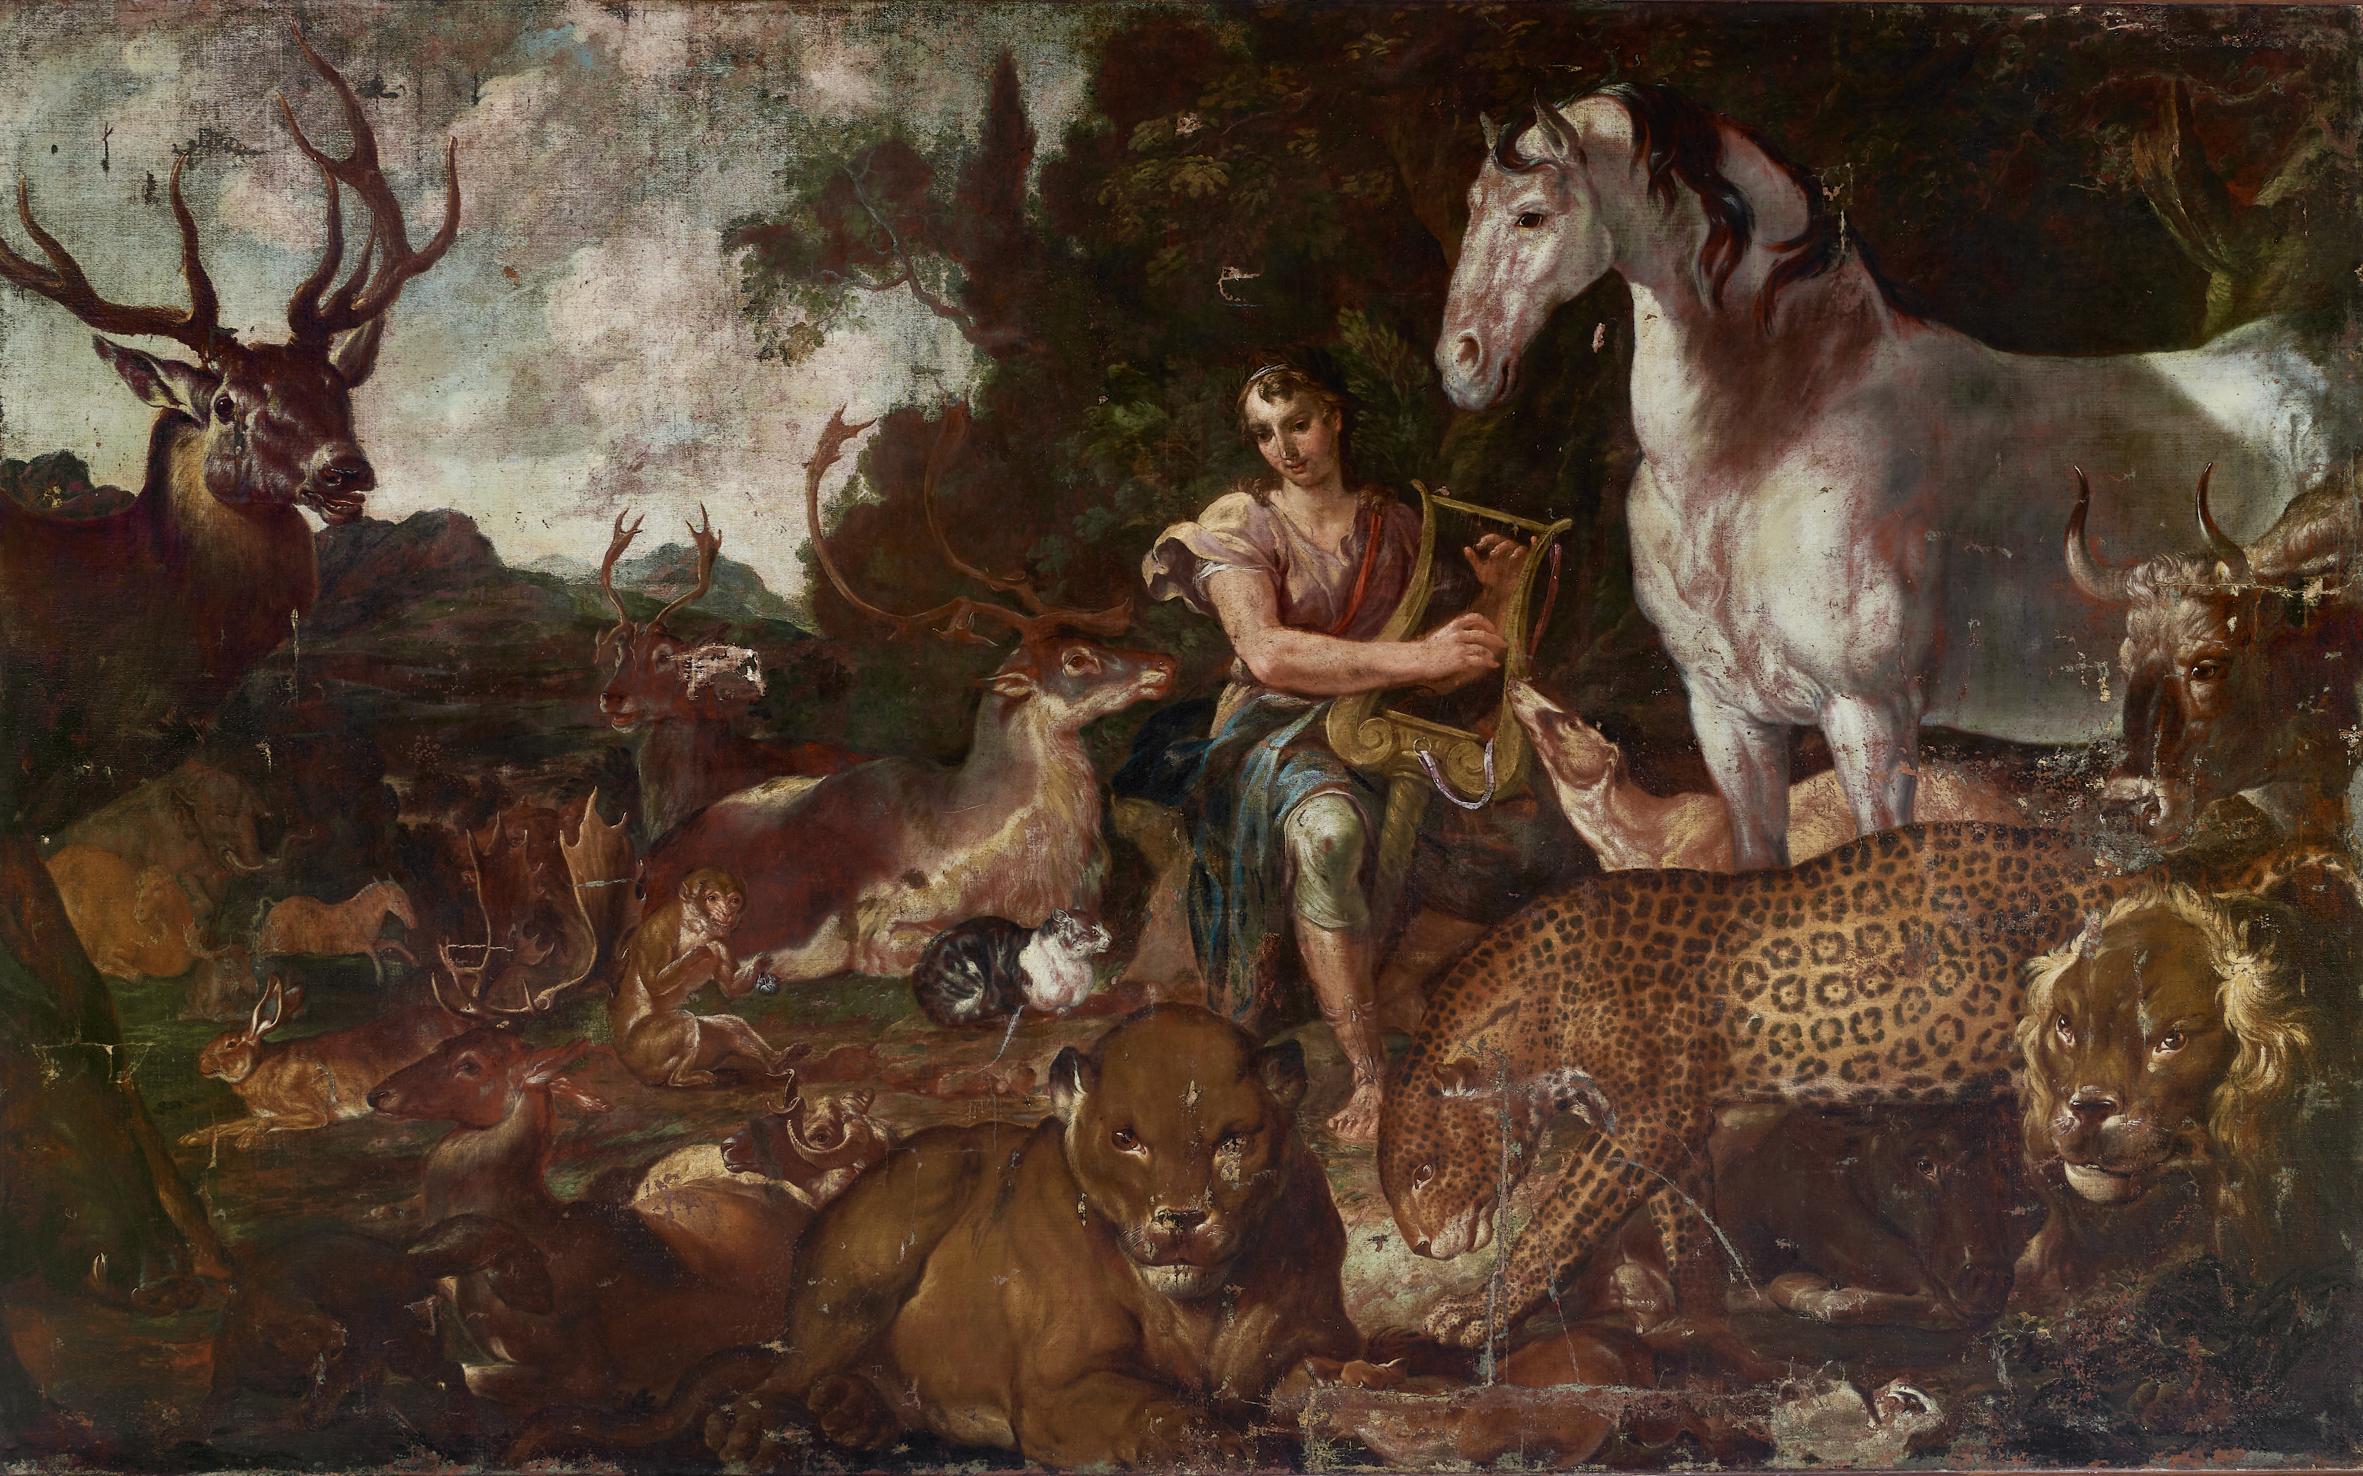 Orfeo incanta gli animali